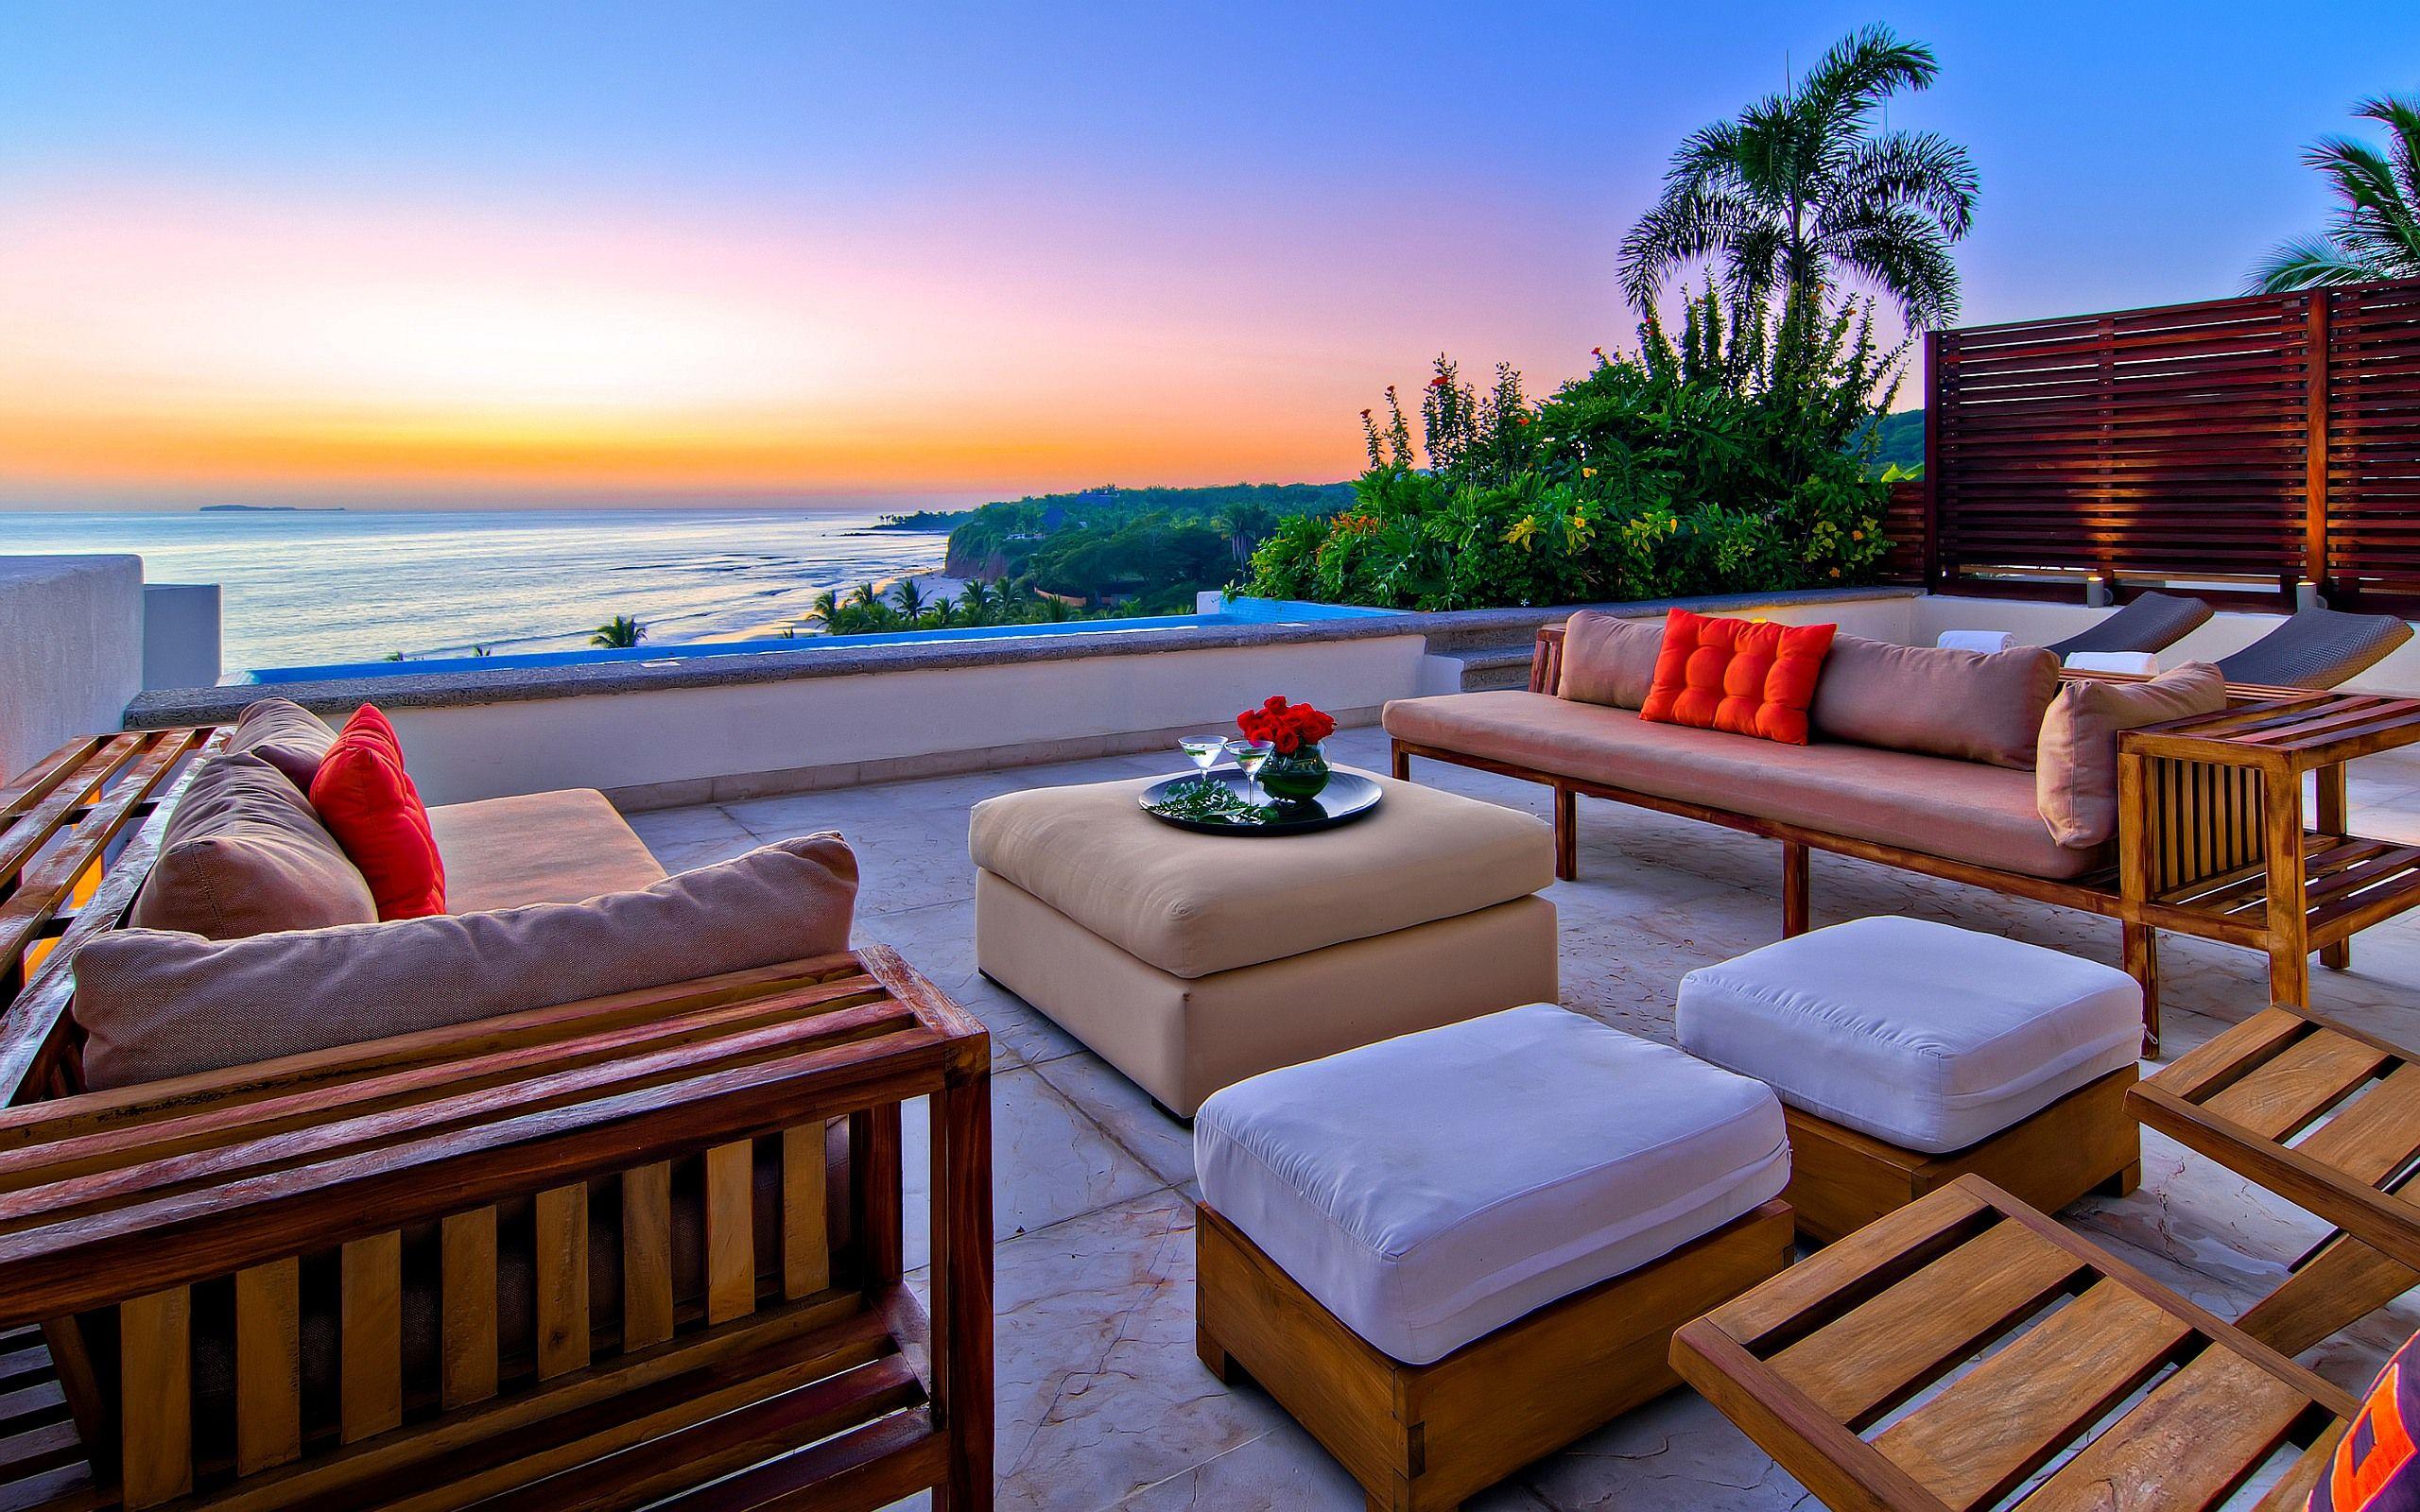 Interio Outdoor 1 Jpg 2560 1600 Salon En Plein Air Mobilier Jardin Decoration Exterieur